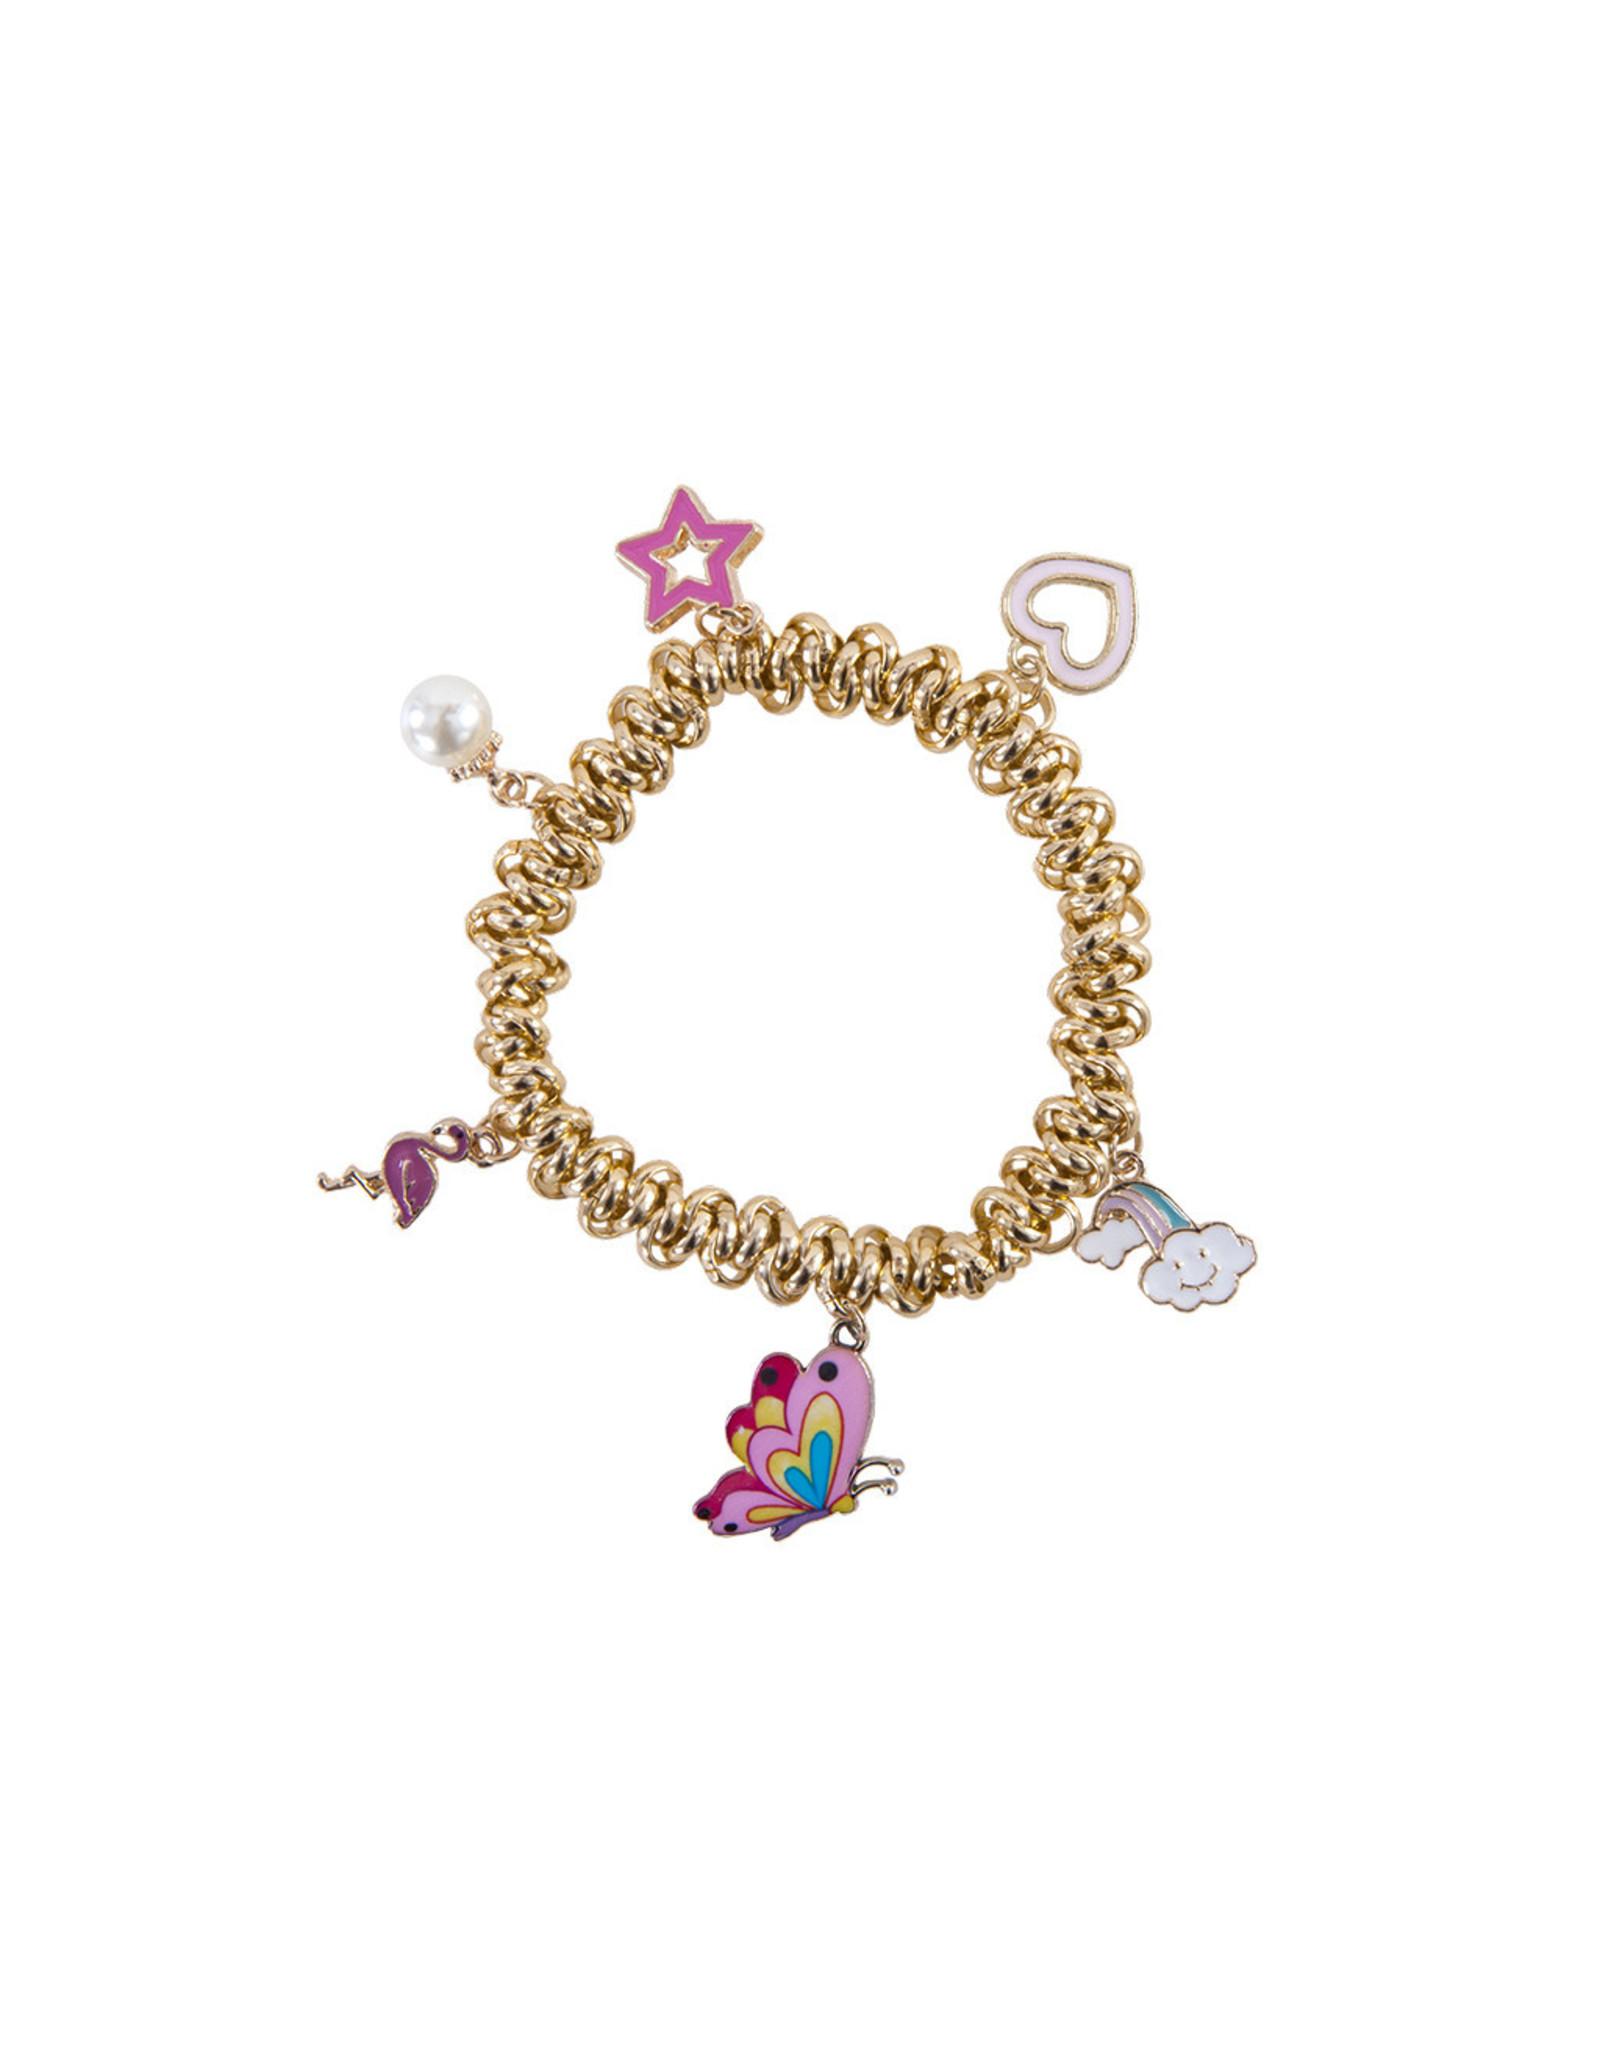 CREATIVE EDUCATION Charm-ed & Chain Bracelet